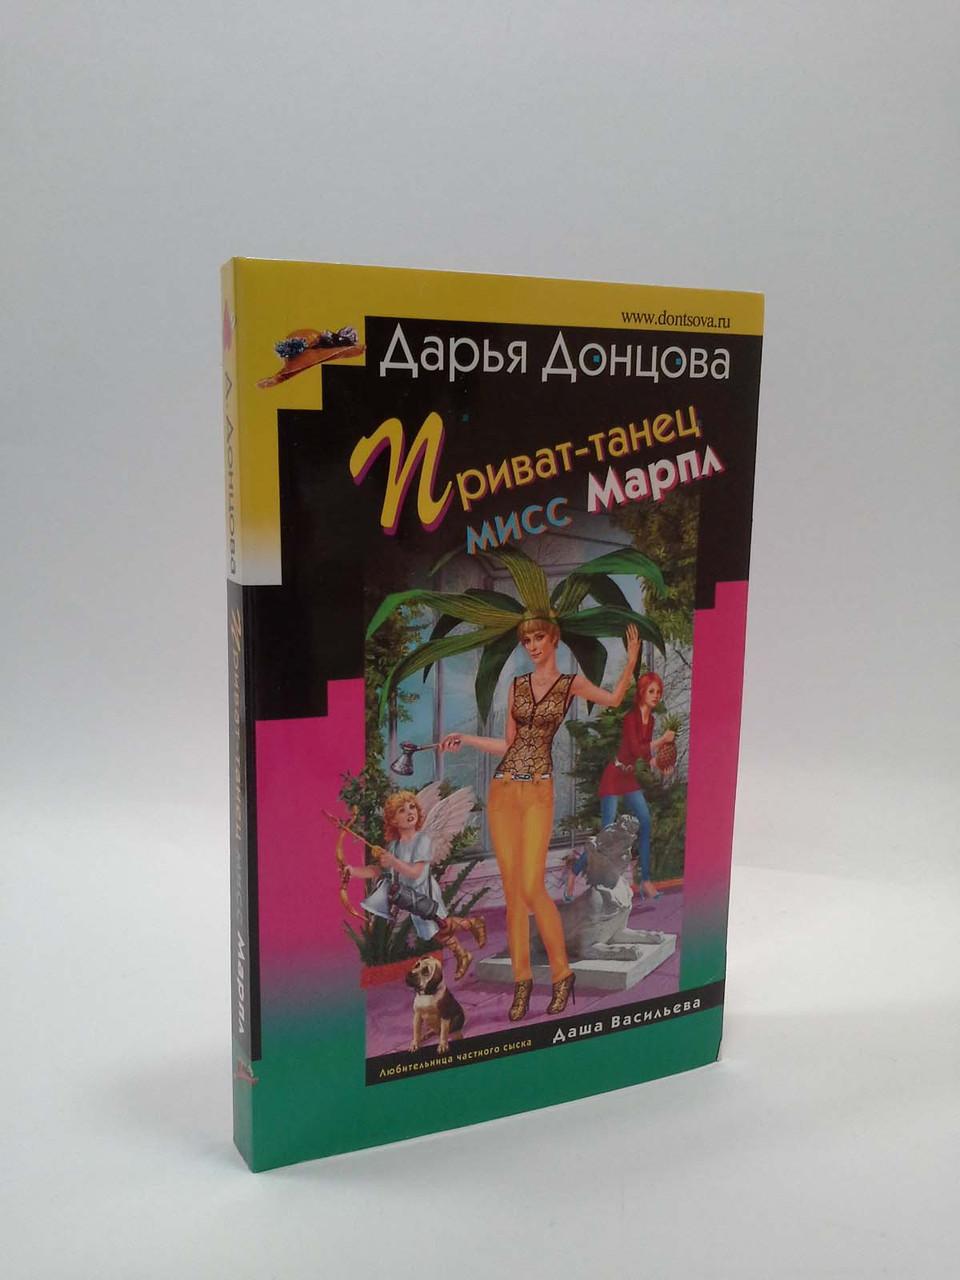 Мини Эксмо Донцова Приват танец мисс Марпл - Буквоїд, книжковий магазин в Белой Церкви